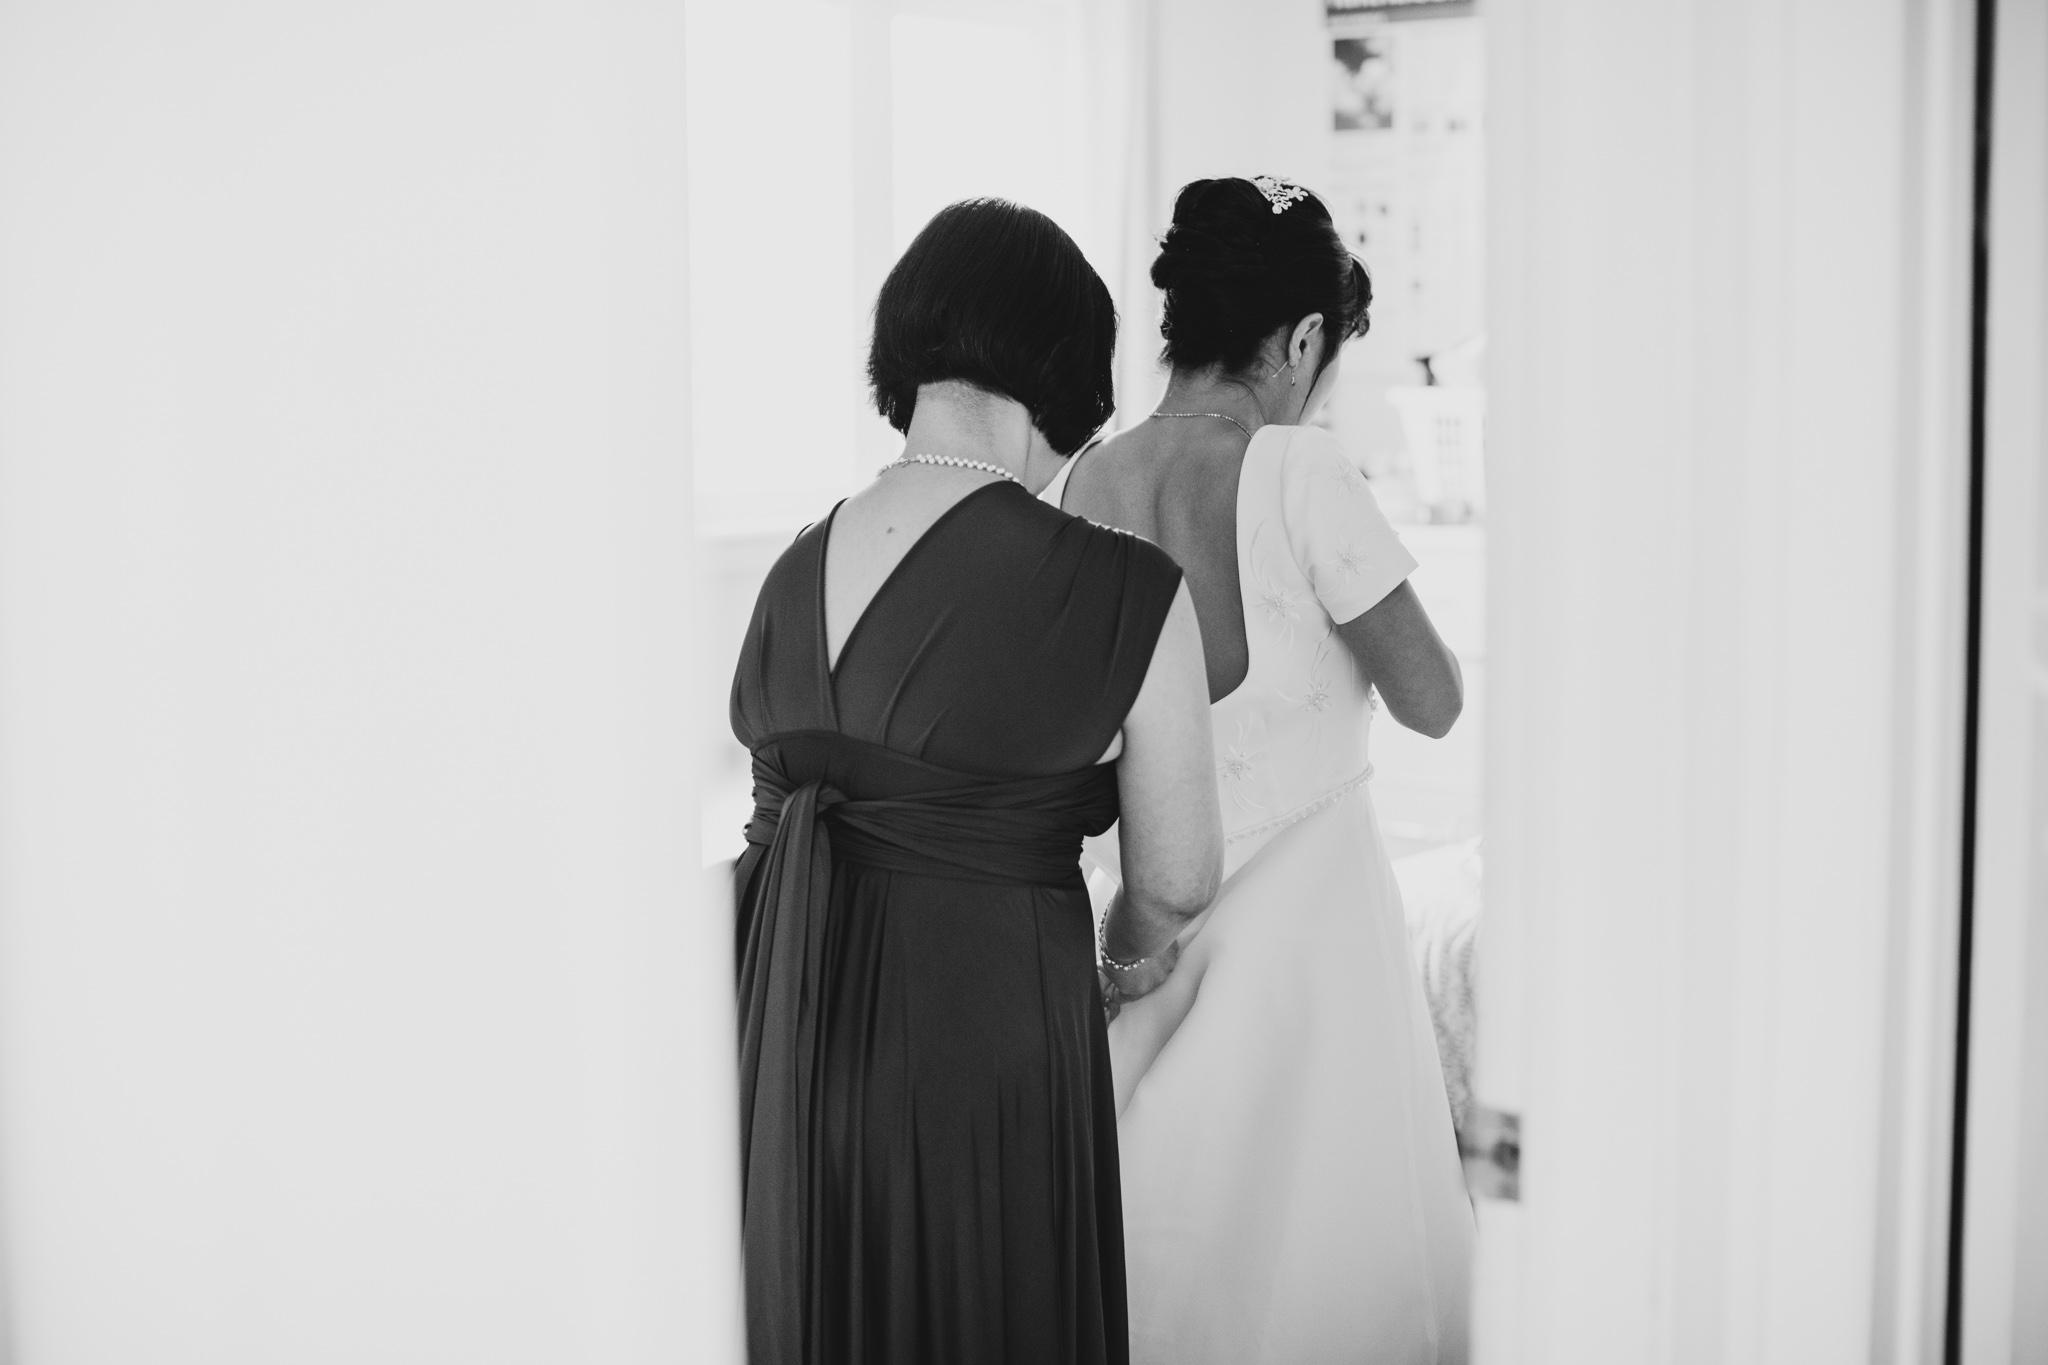 088-WEB-Jonathan-Kuhn-Photography-Alicia-Gabe-Wedding-3231.jpg